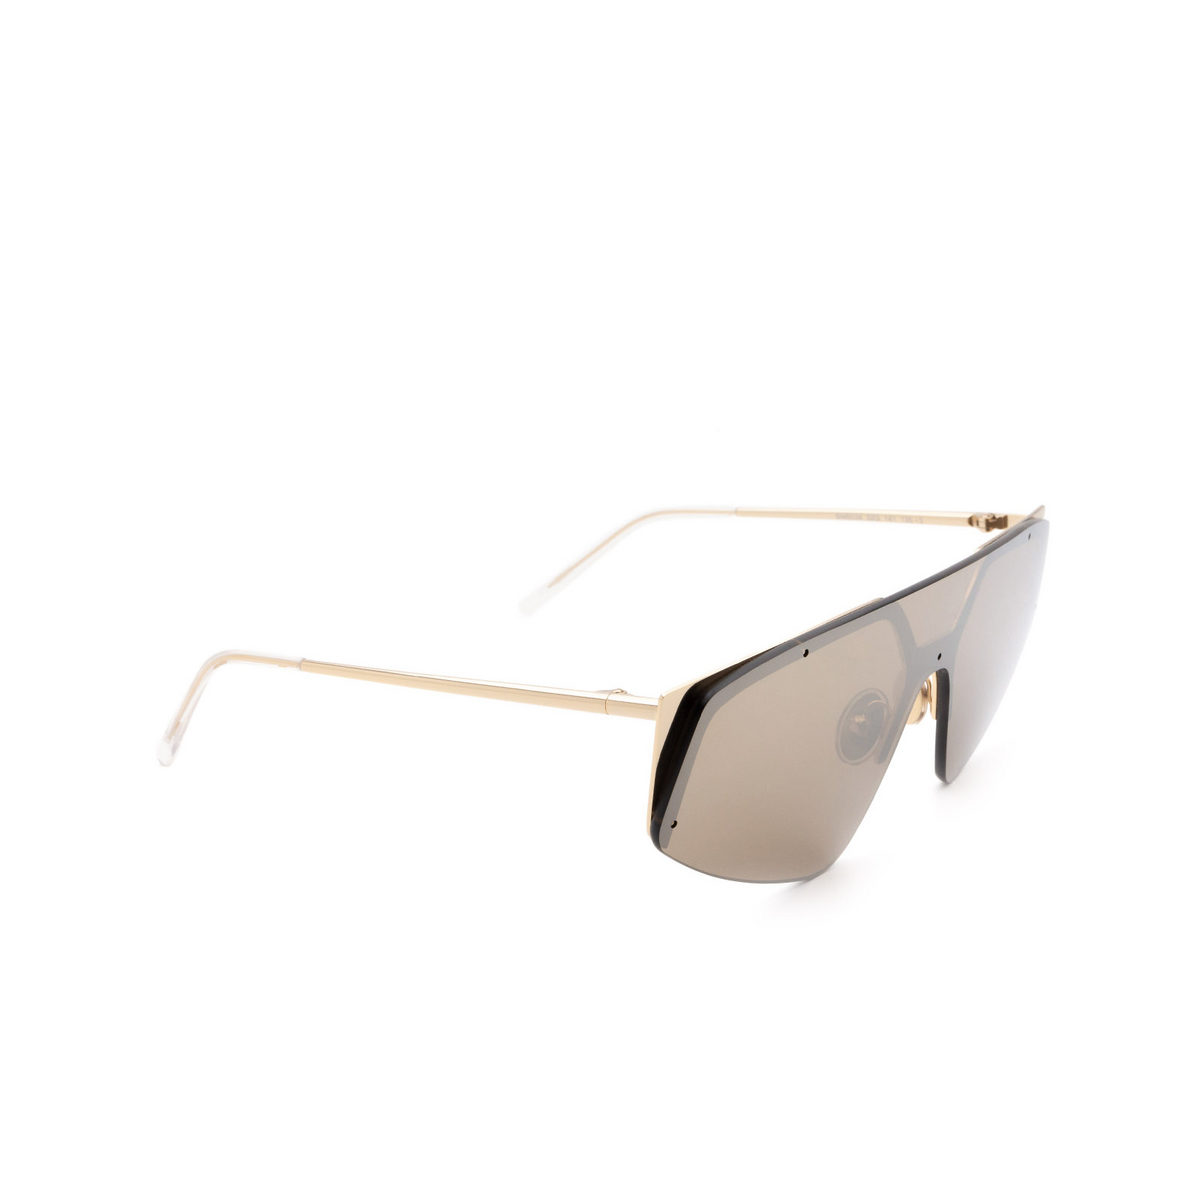 Sportmax® Mask Sunglasses: SM0034 color Gold 32G - three-quarters view.